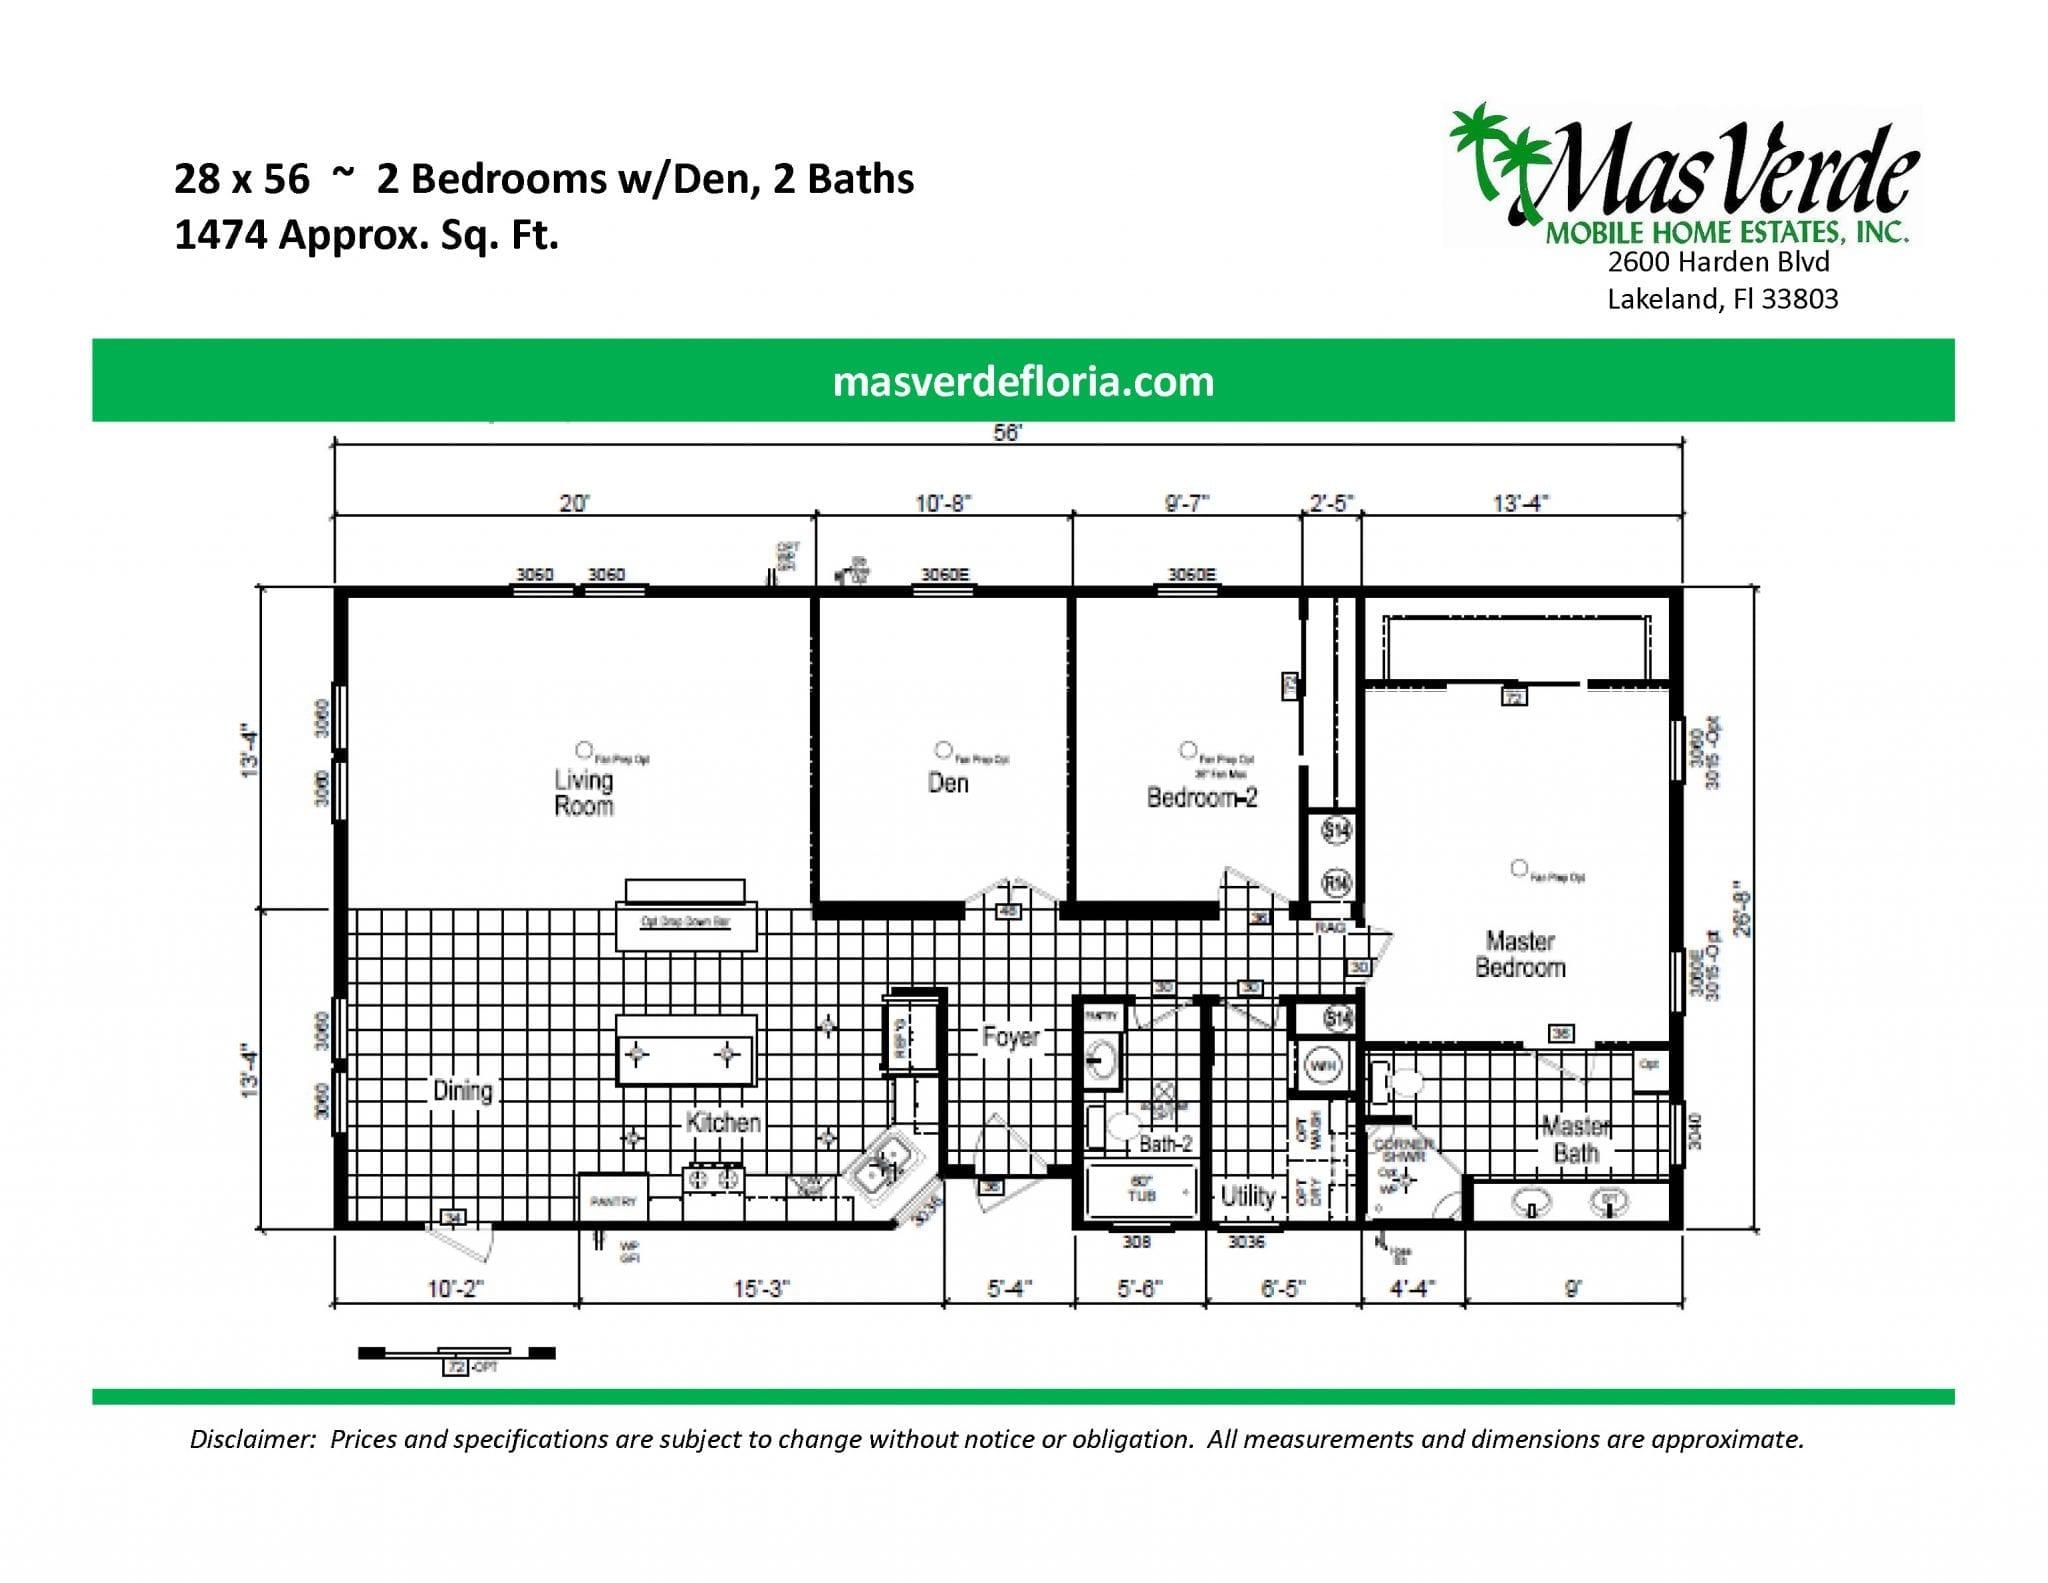 Mv 403 New Home Sale Pending